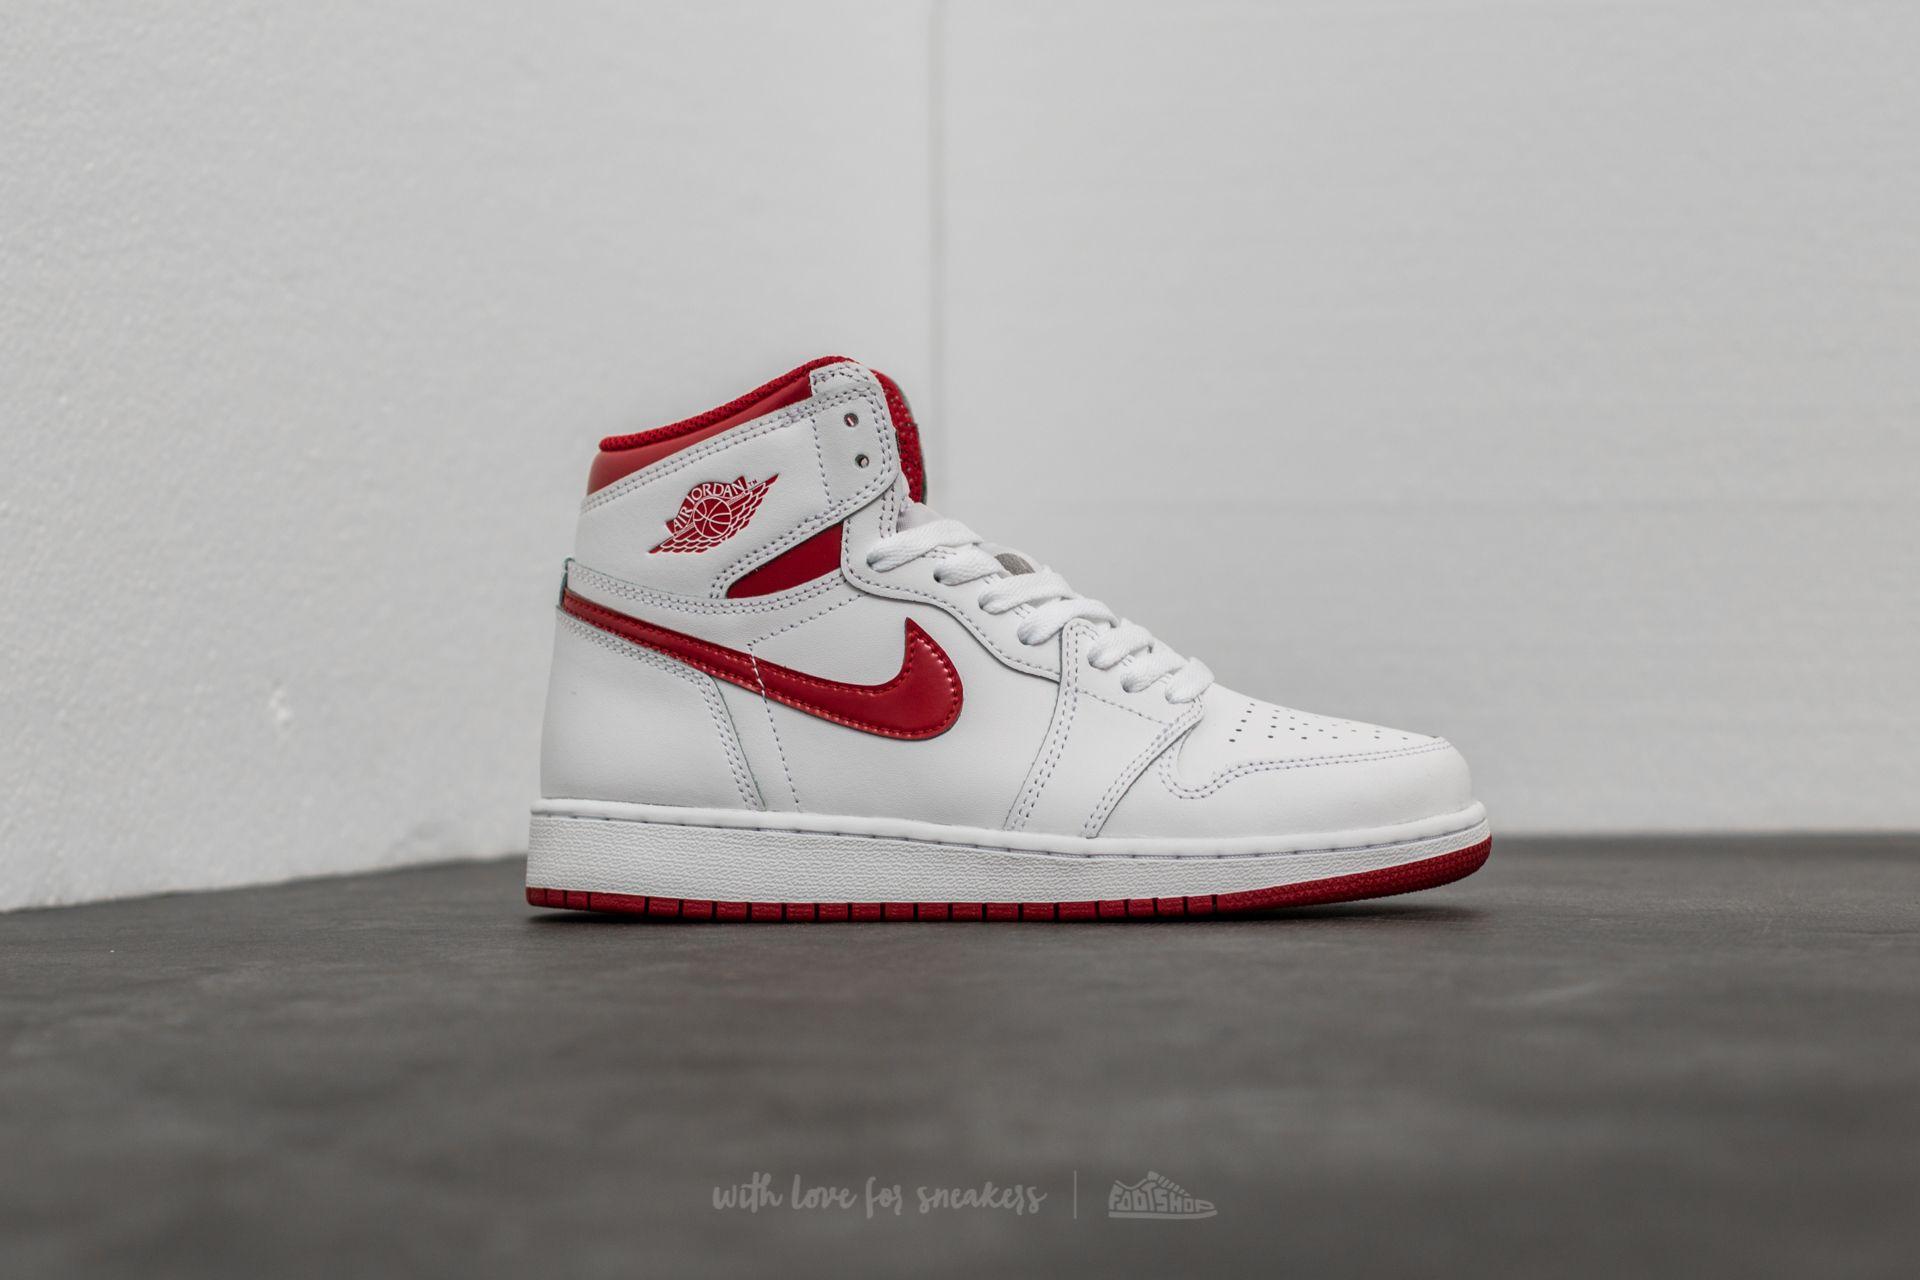 Red' Red Jordan Retro Og 1 High Air Varsity Bg 'metallic White 5Aq3R4jL